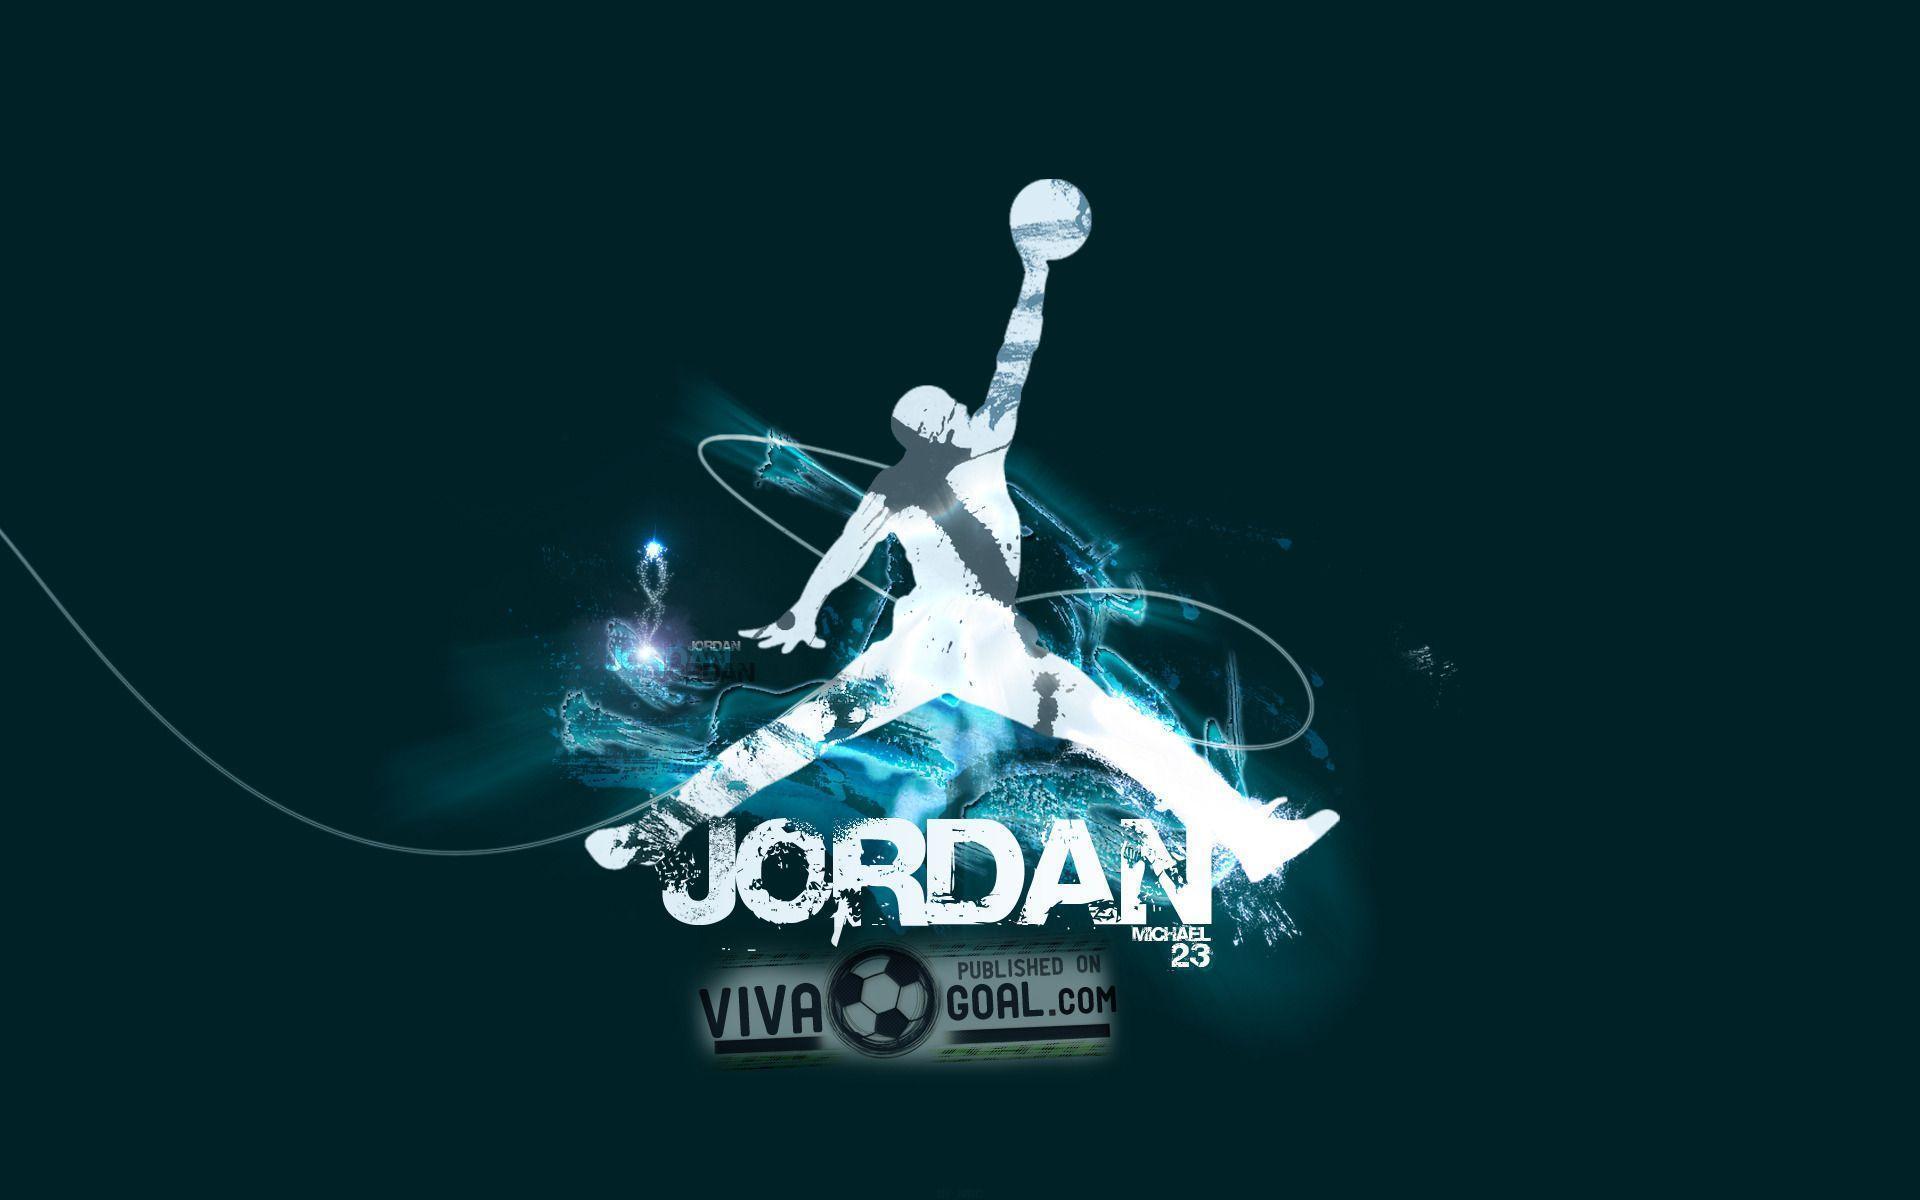 Logos, Hd images and Jordans on Pinterest